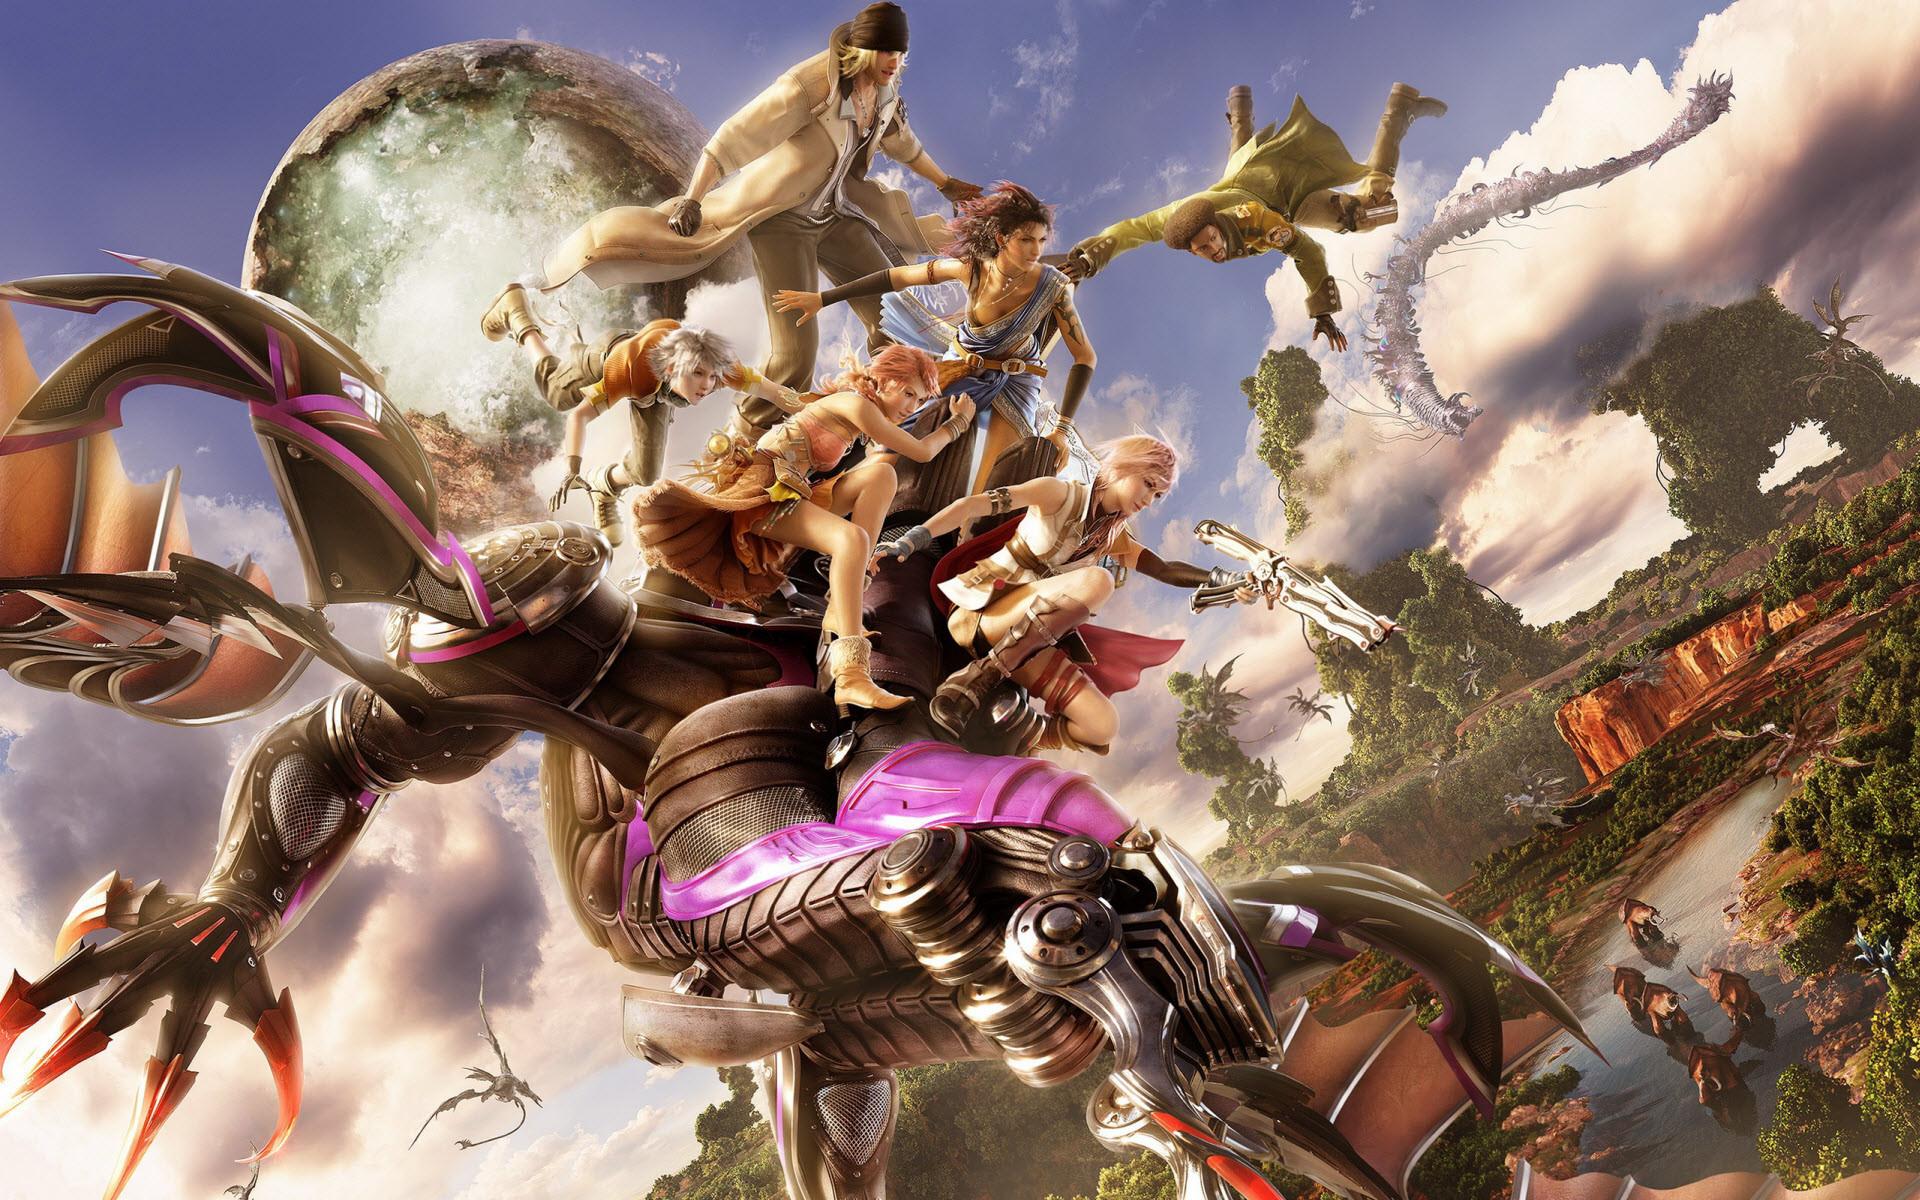 Final Fantasy 13 Wallpaper Hd